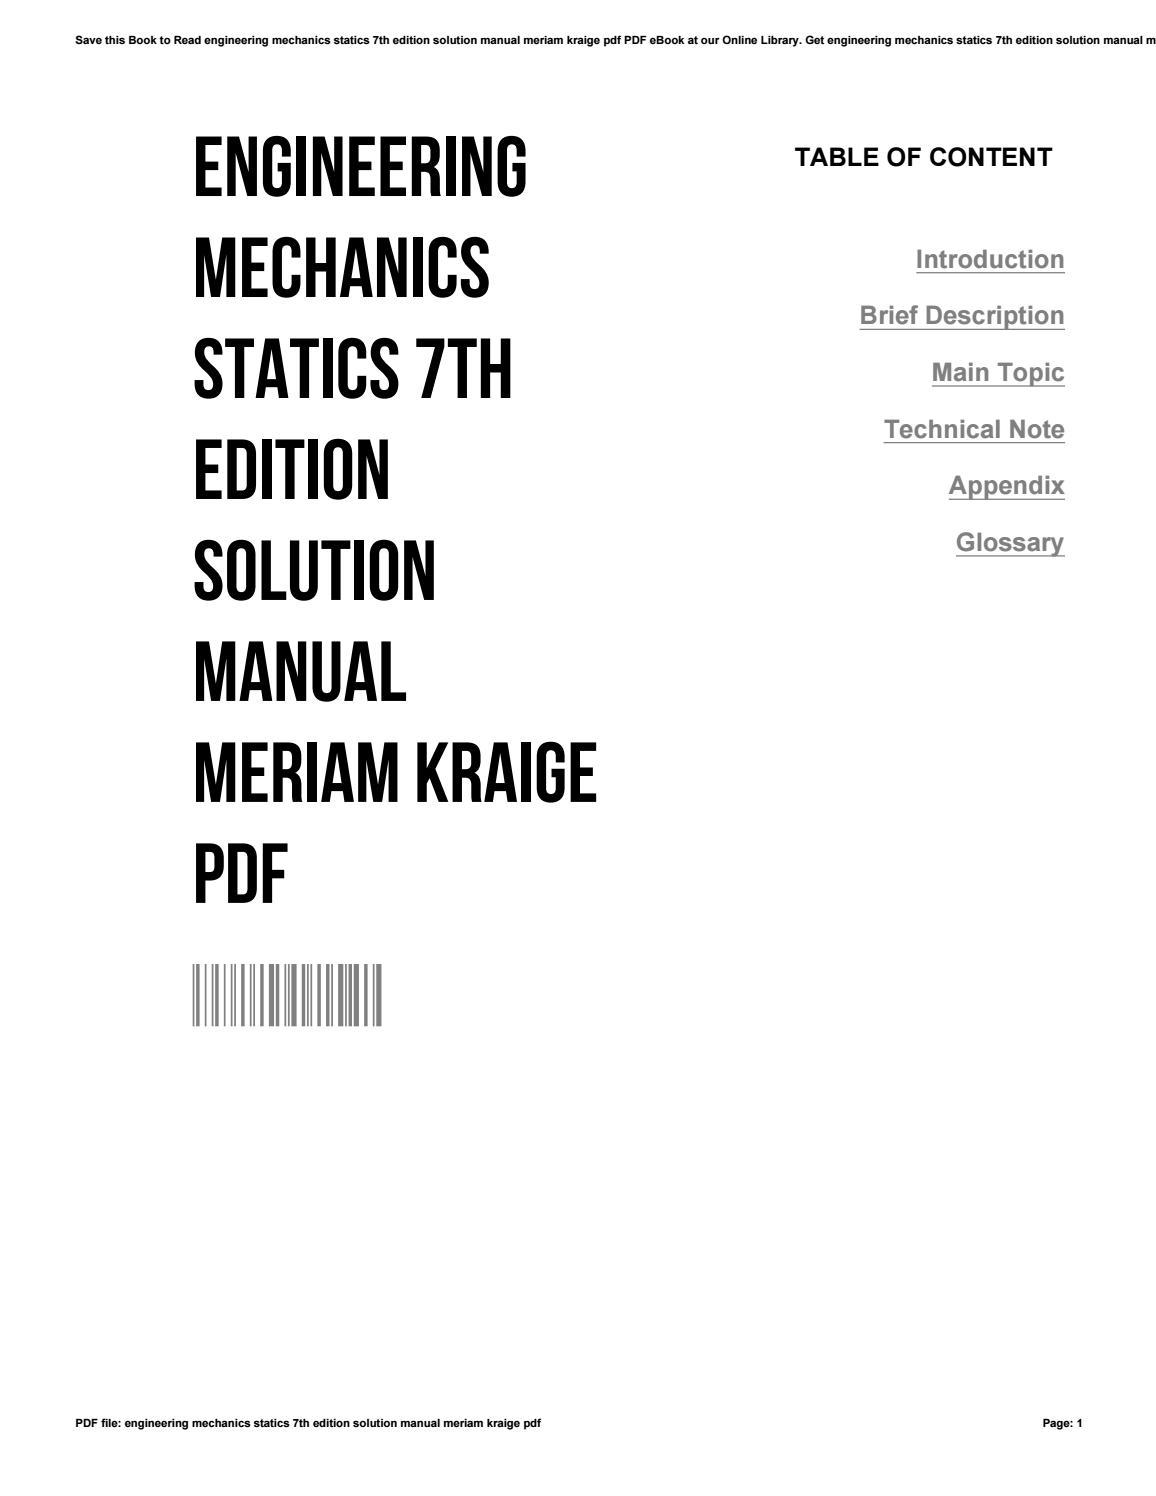 engineering mechanics dynamics 7th edition solution manual - Monza